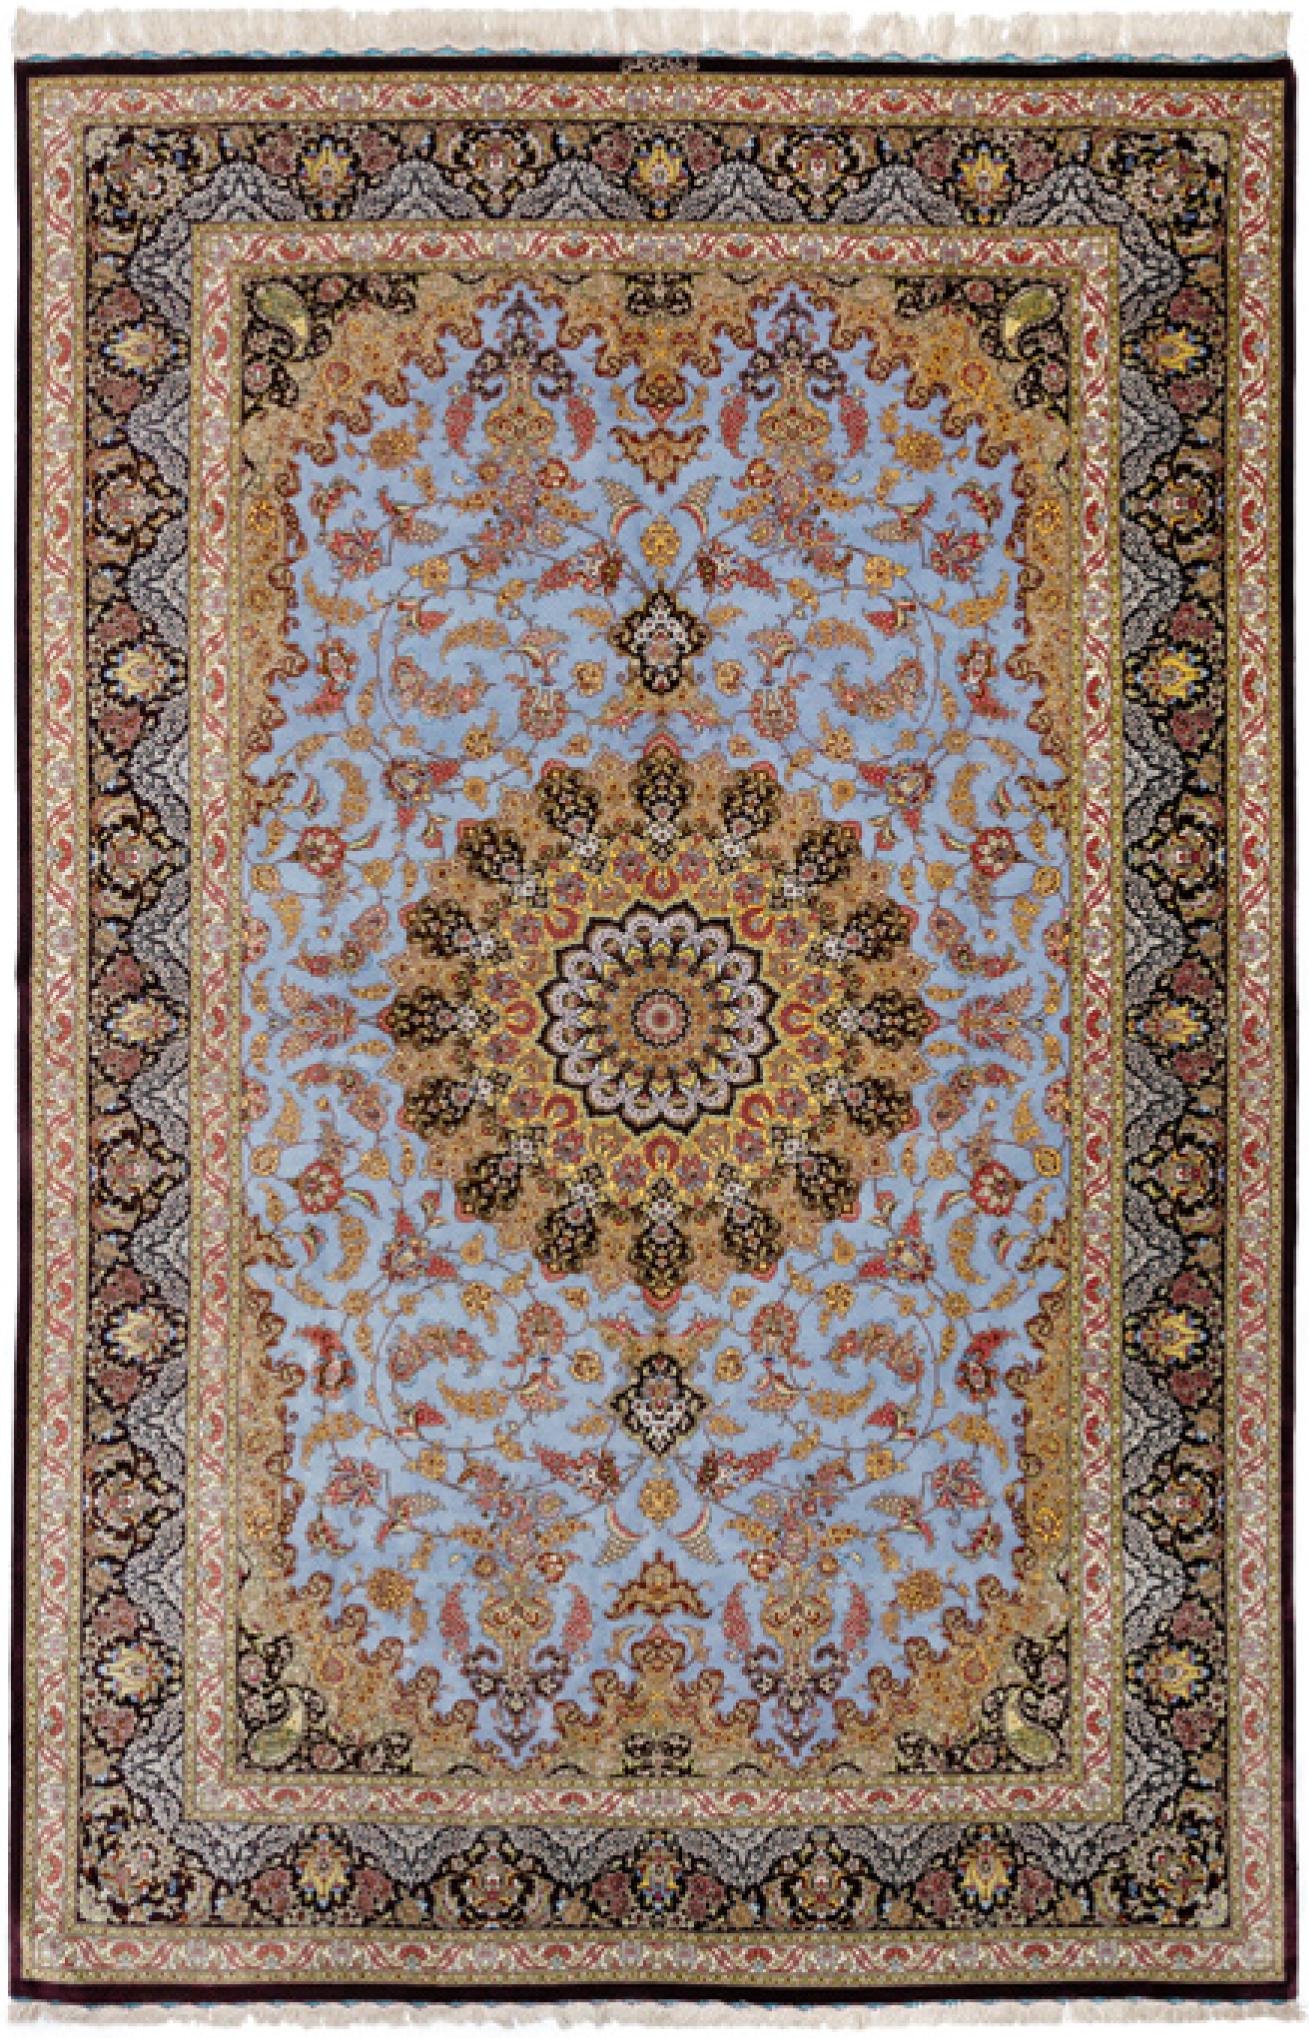 QUM KADHIMI PURE SILK CARPET artwork by Baft Iran Qum Kadhimi - art listed for sale on Artplode